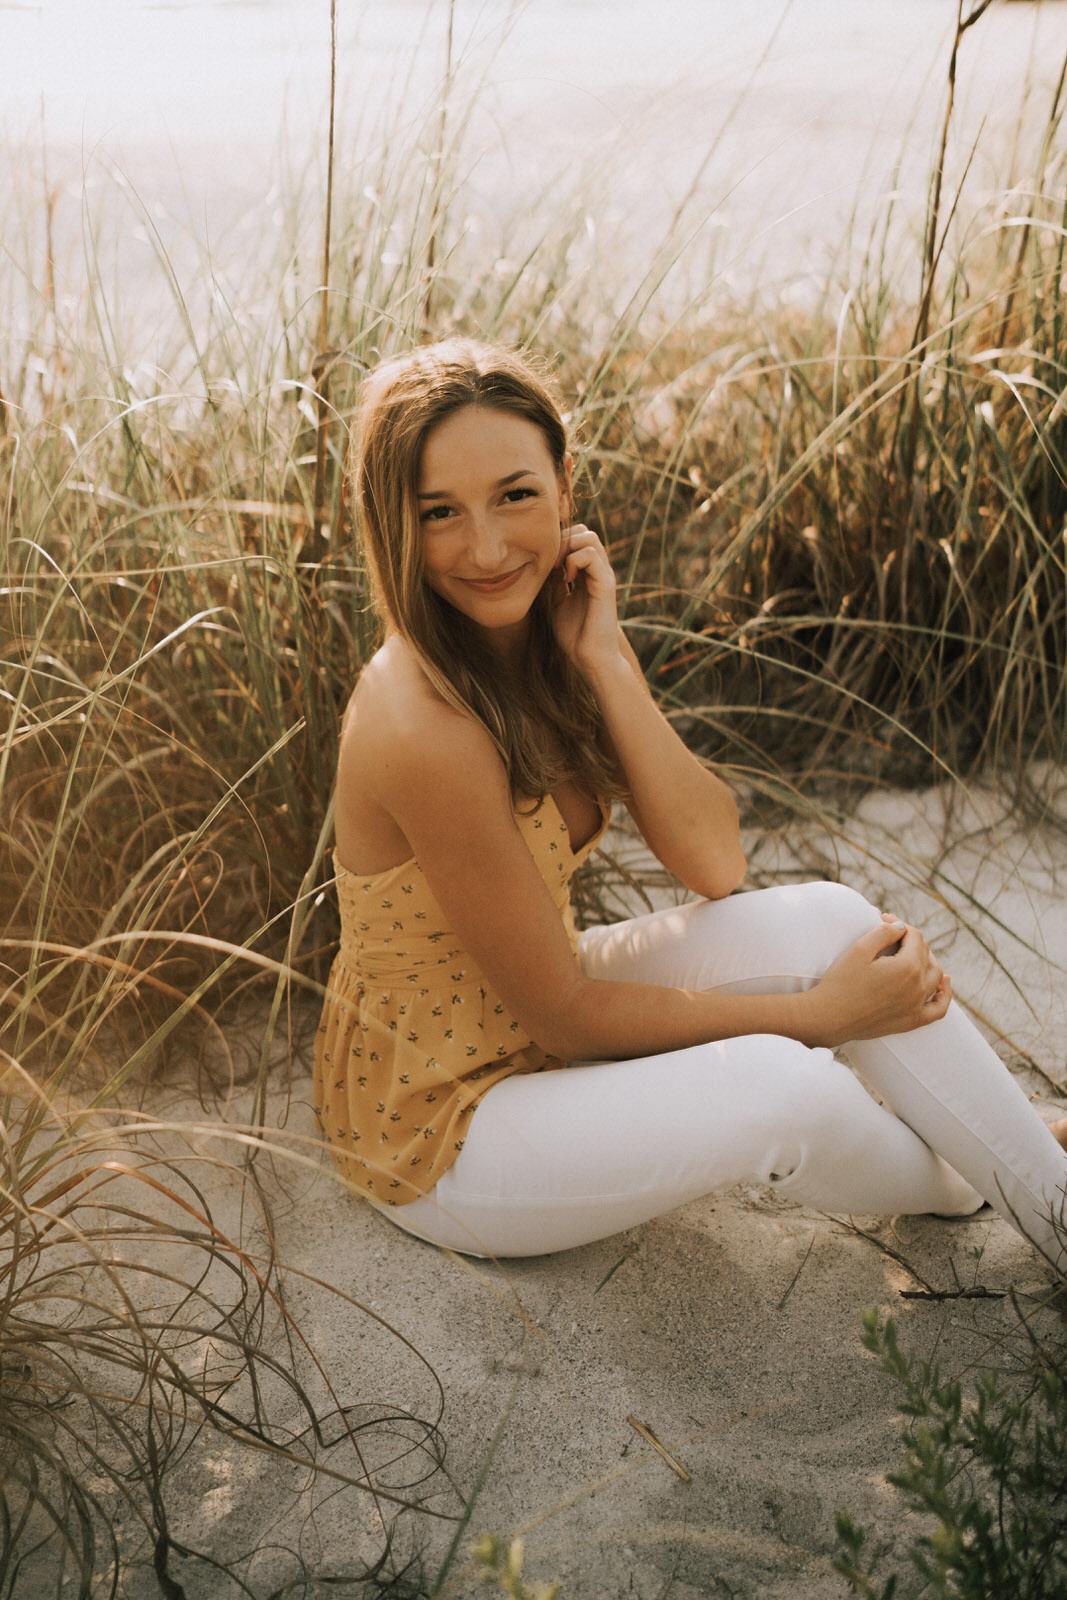 Fort Myers Senior Photos on Bonita Beach - Michelle Gonzalez Photography - Sammie-69.JPG